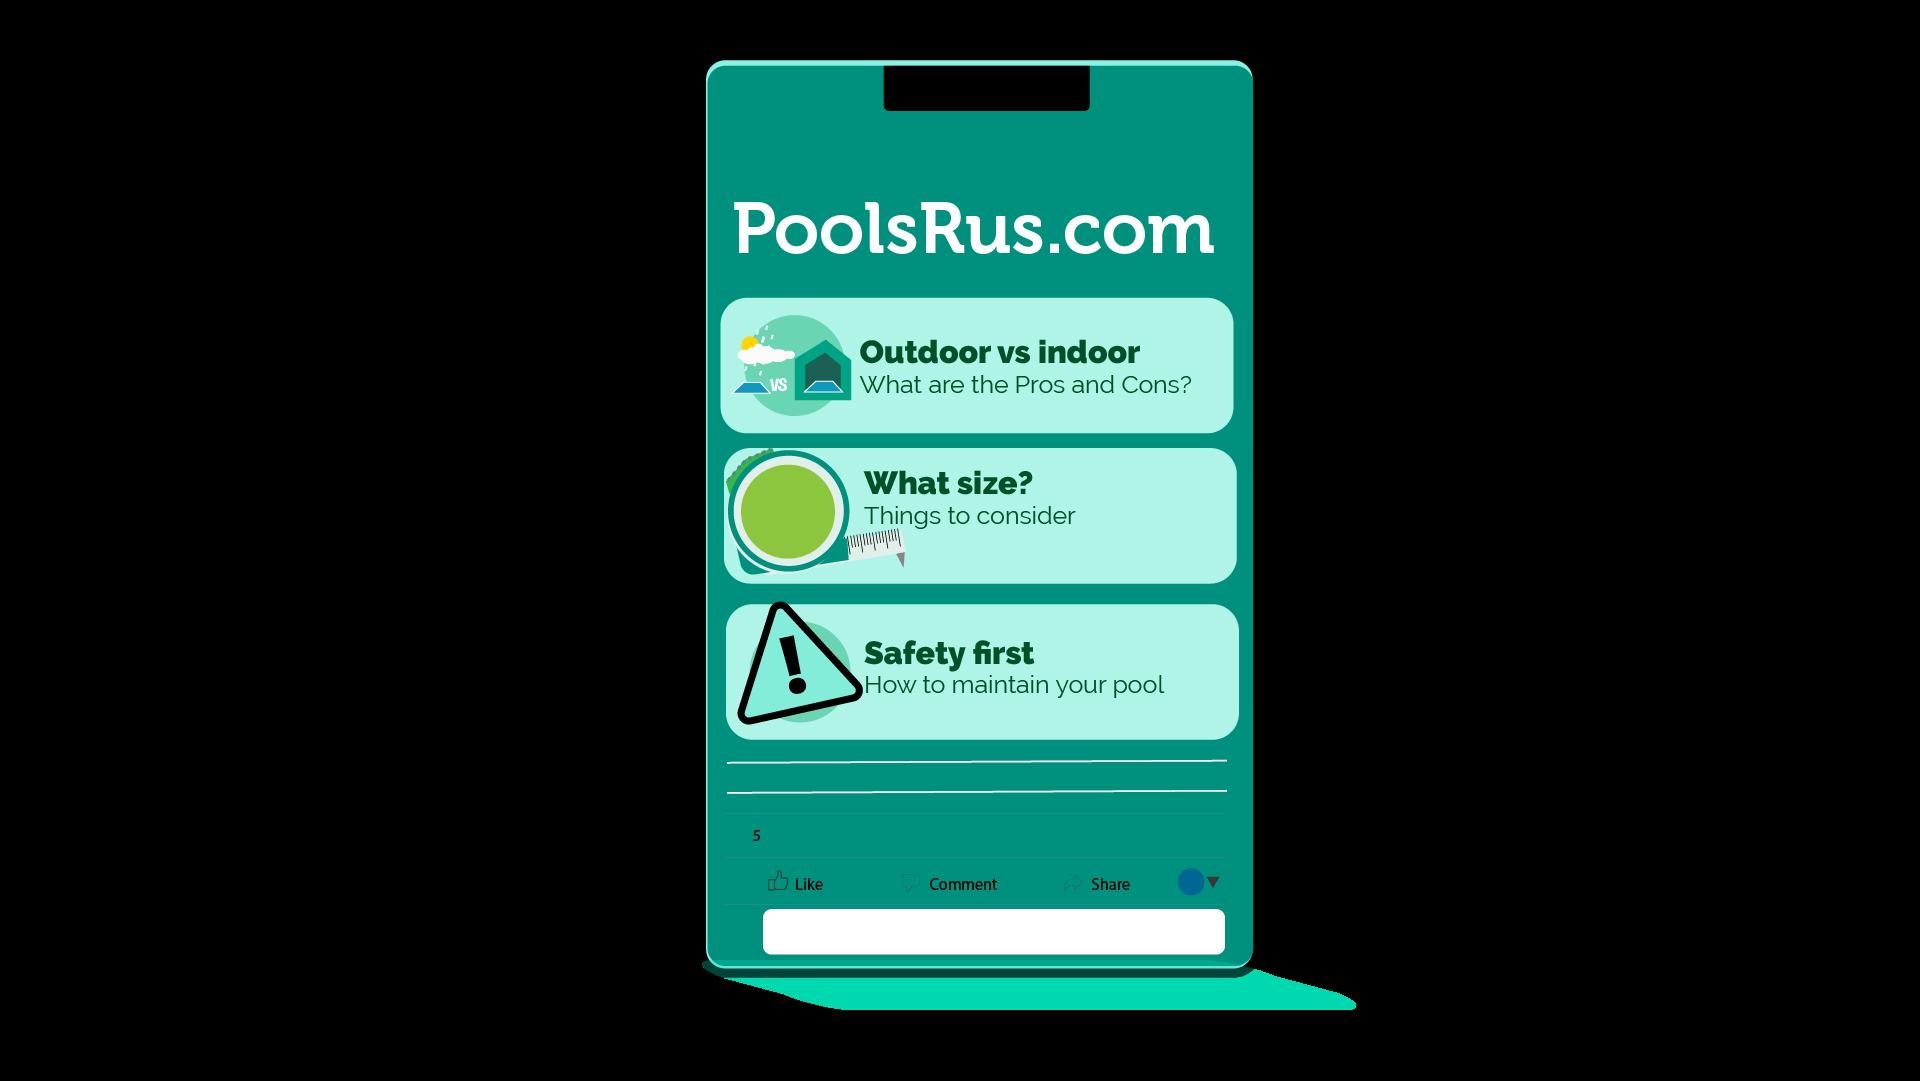 Pools r us webpage on mobile